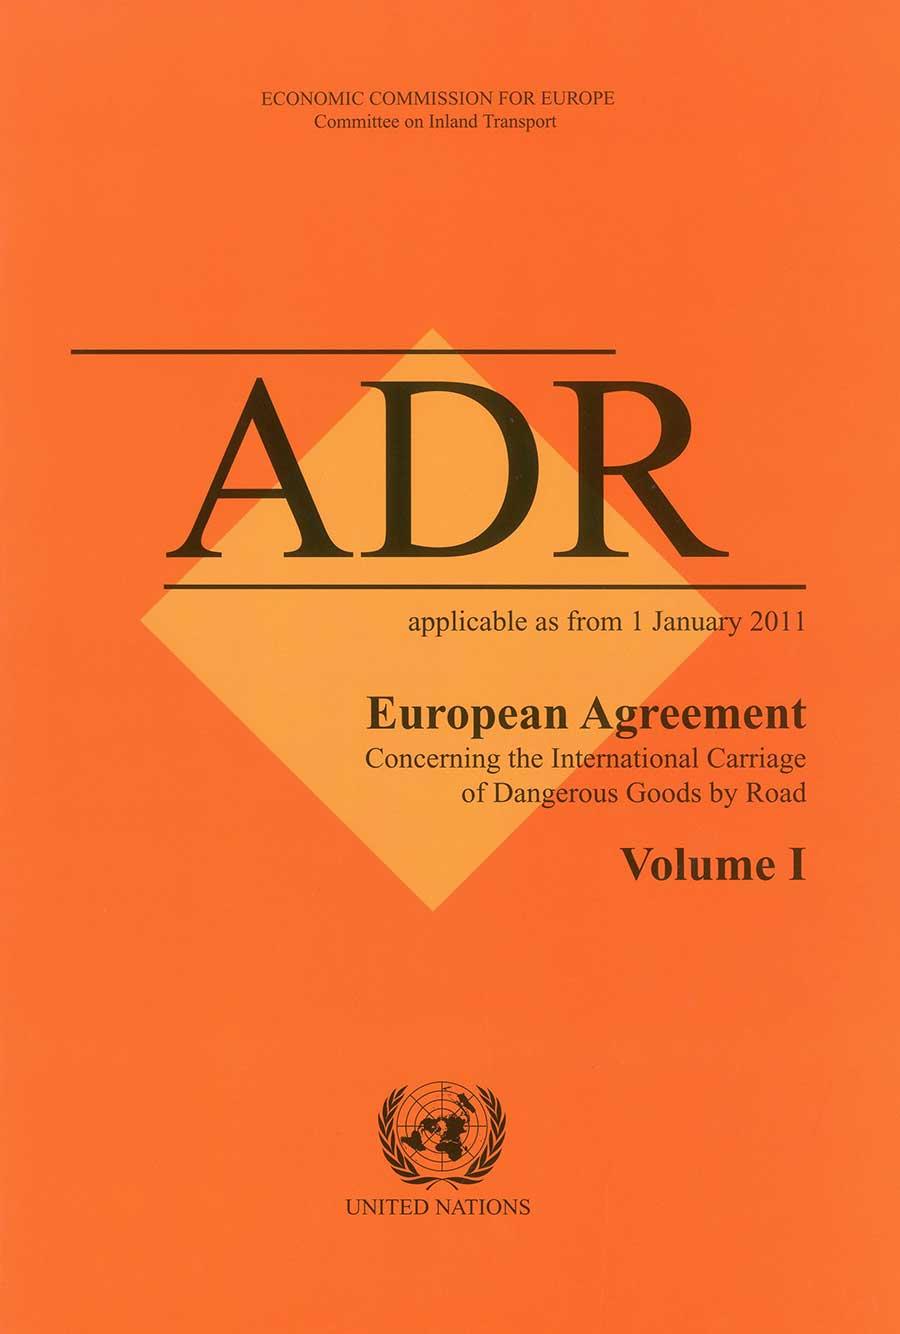 ADR-serifikat